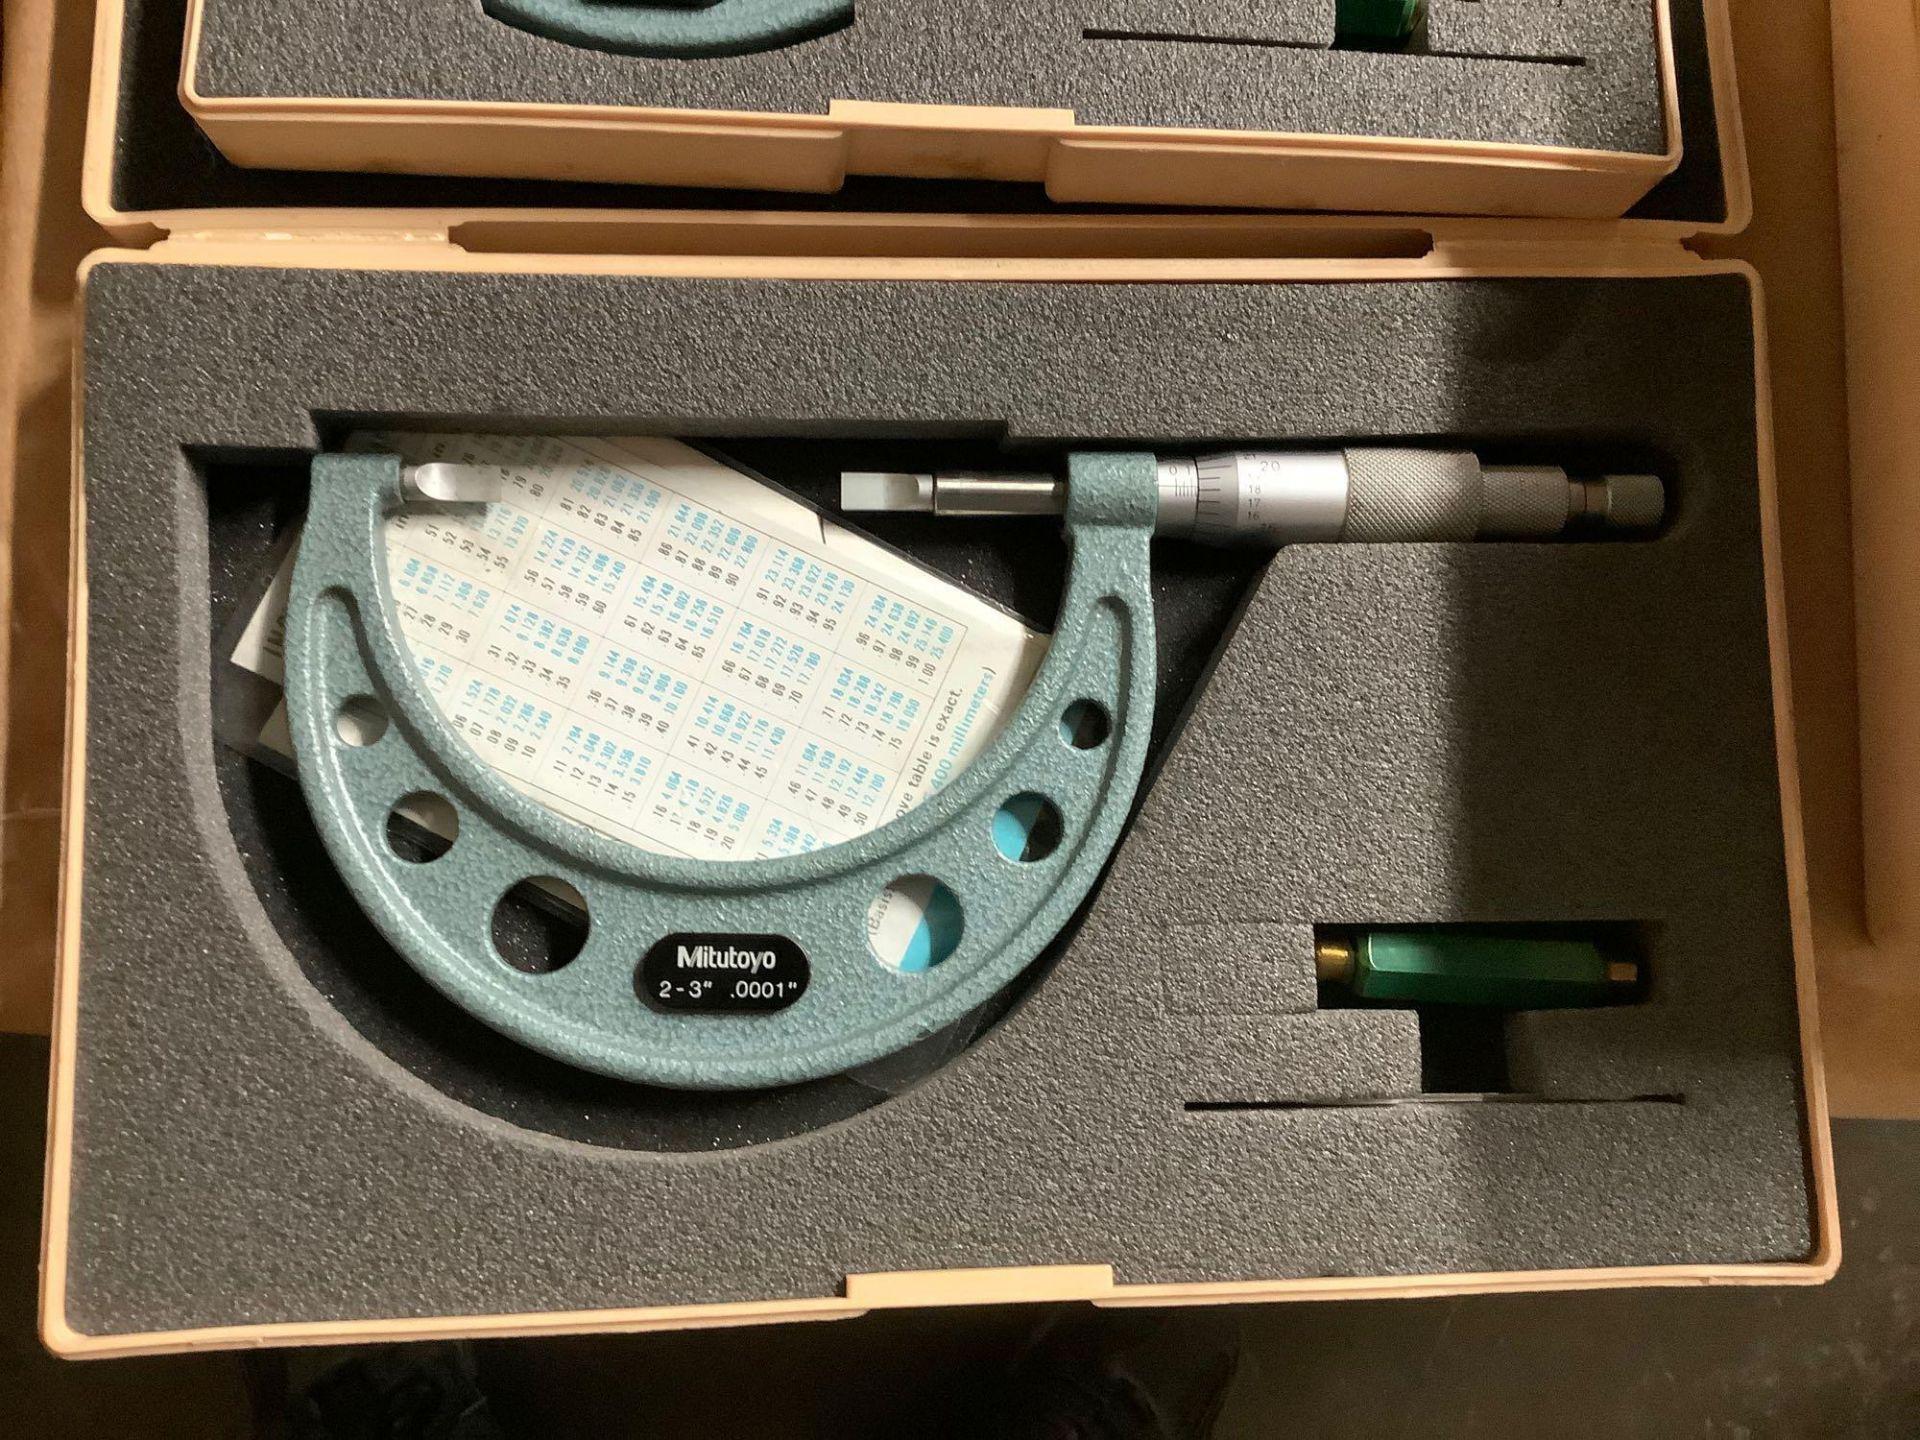 Lot of 3 Mitutoyo Blade Micrometers - Image 2 of 5